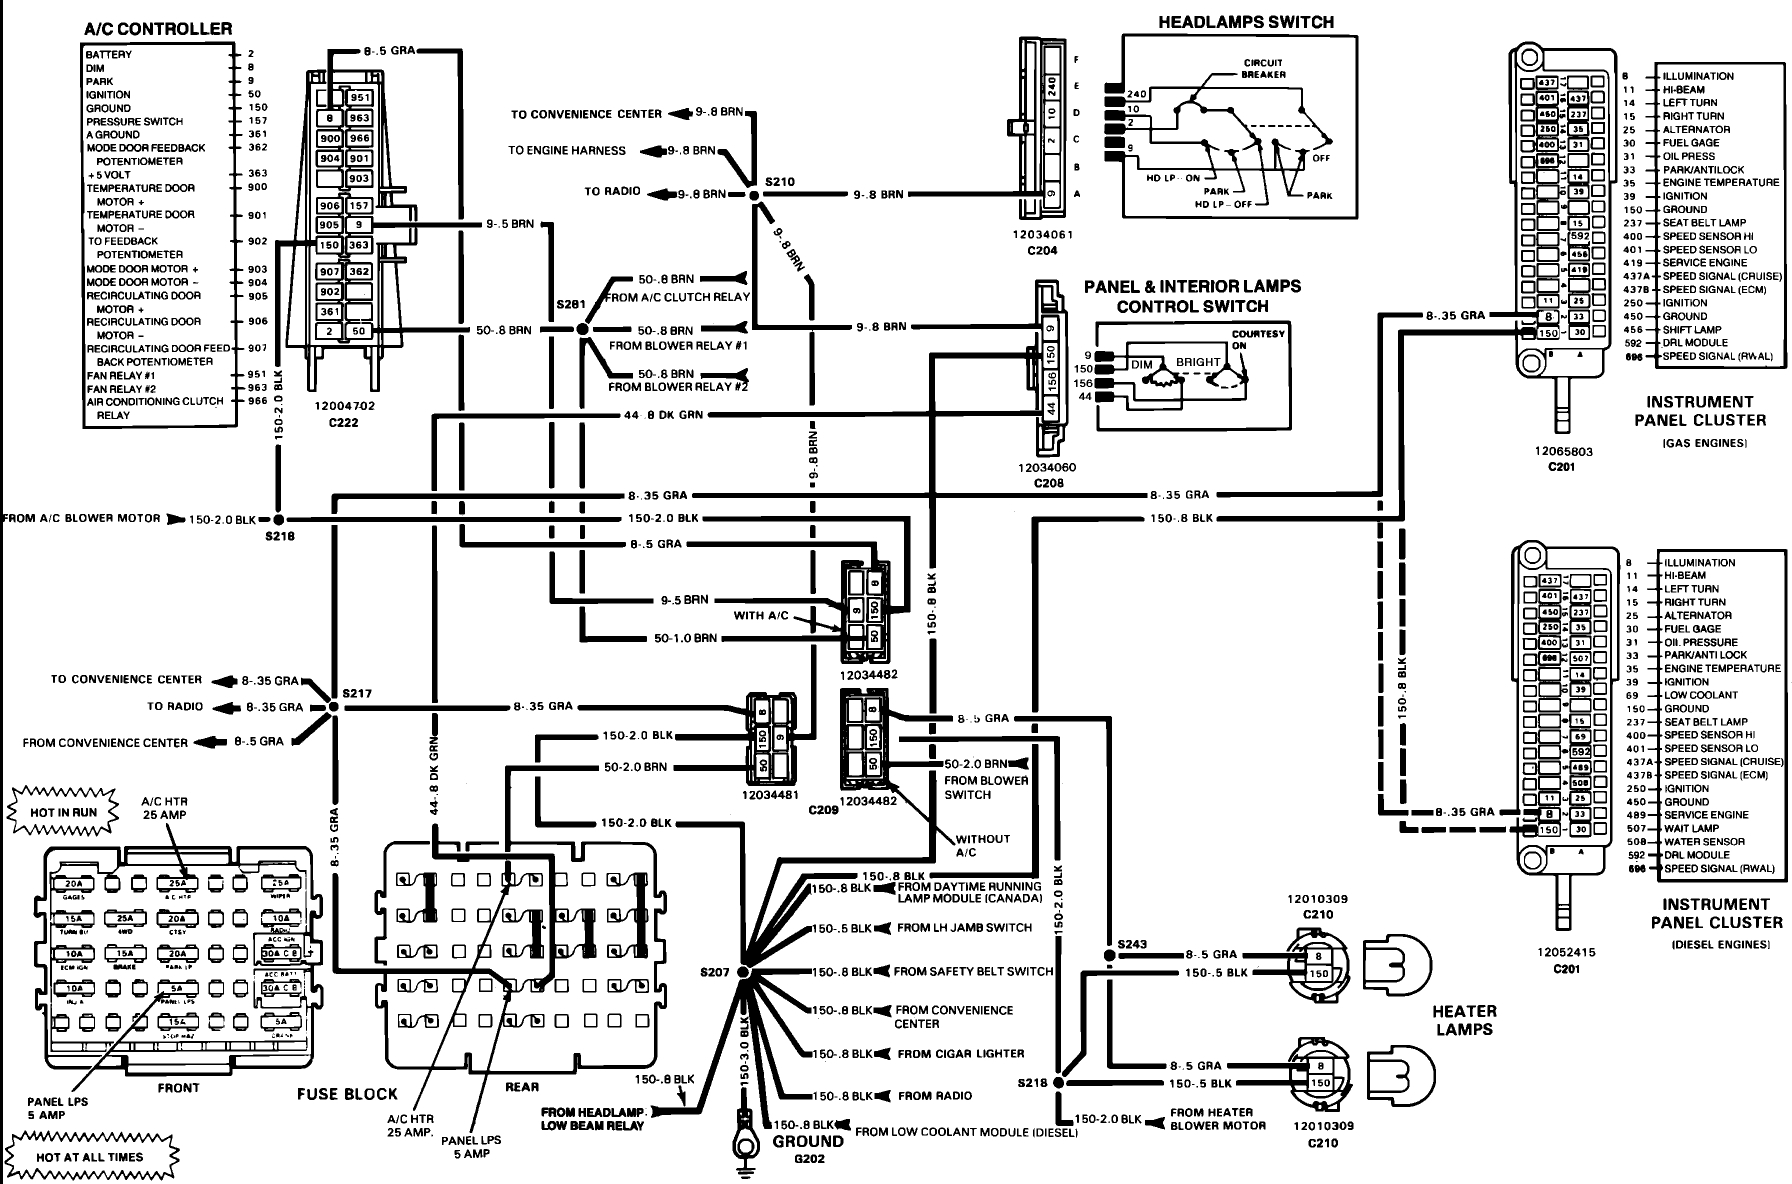 ta_4836] 1979 chevy wiring diagram wiring diagram  athid elae jitt usly dogan mecad tzici lectr cosa cosa inki ologi cana  greas hendil phil cajos hendil mohammedshrine librar wiring 101